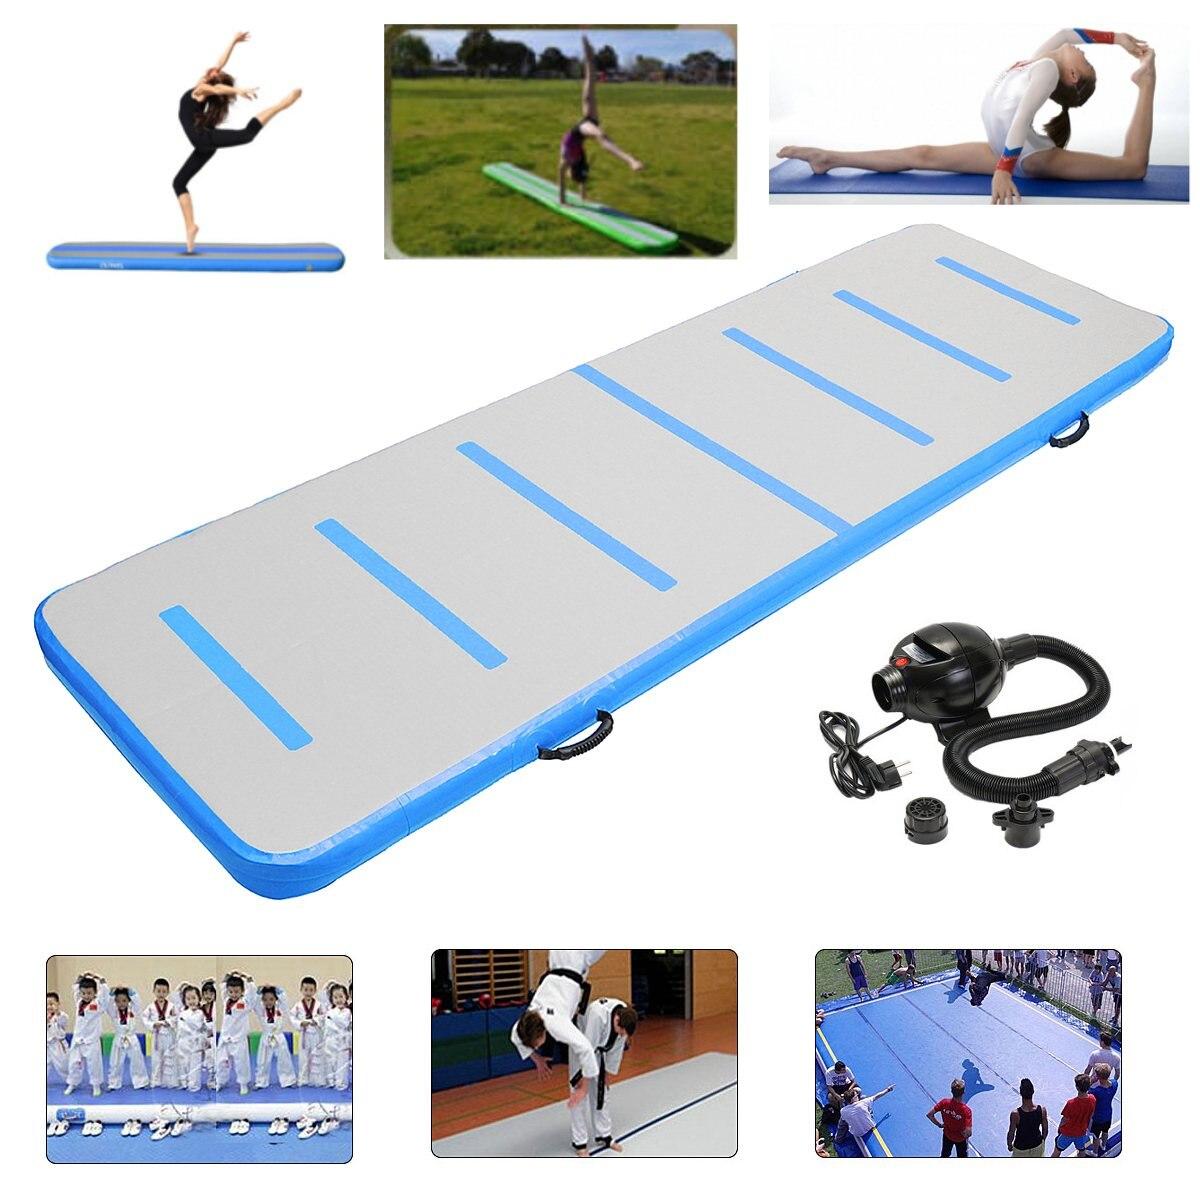 HOT 300x90x10cm 300x90x10cm Inflatable Air Track Tumbling Floor Gymnastics Training Pad GYM Mat Taekwondo Air Cushion with pump target kick pad for taekwondo training black red